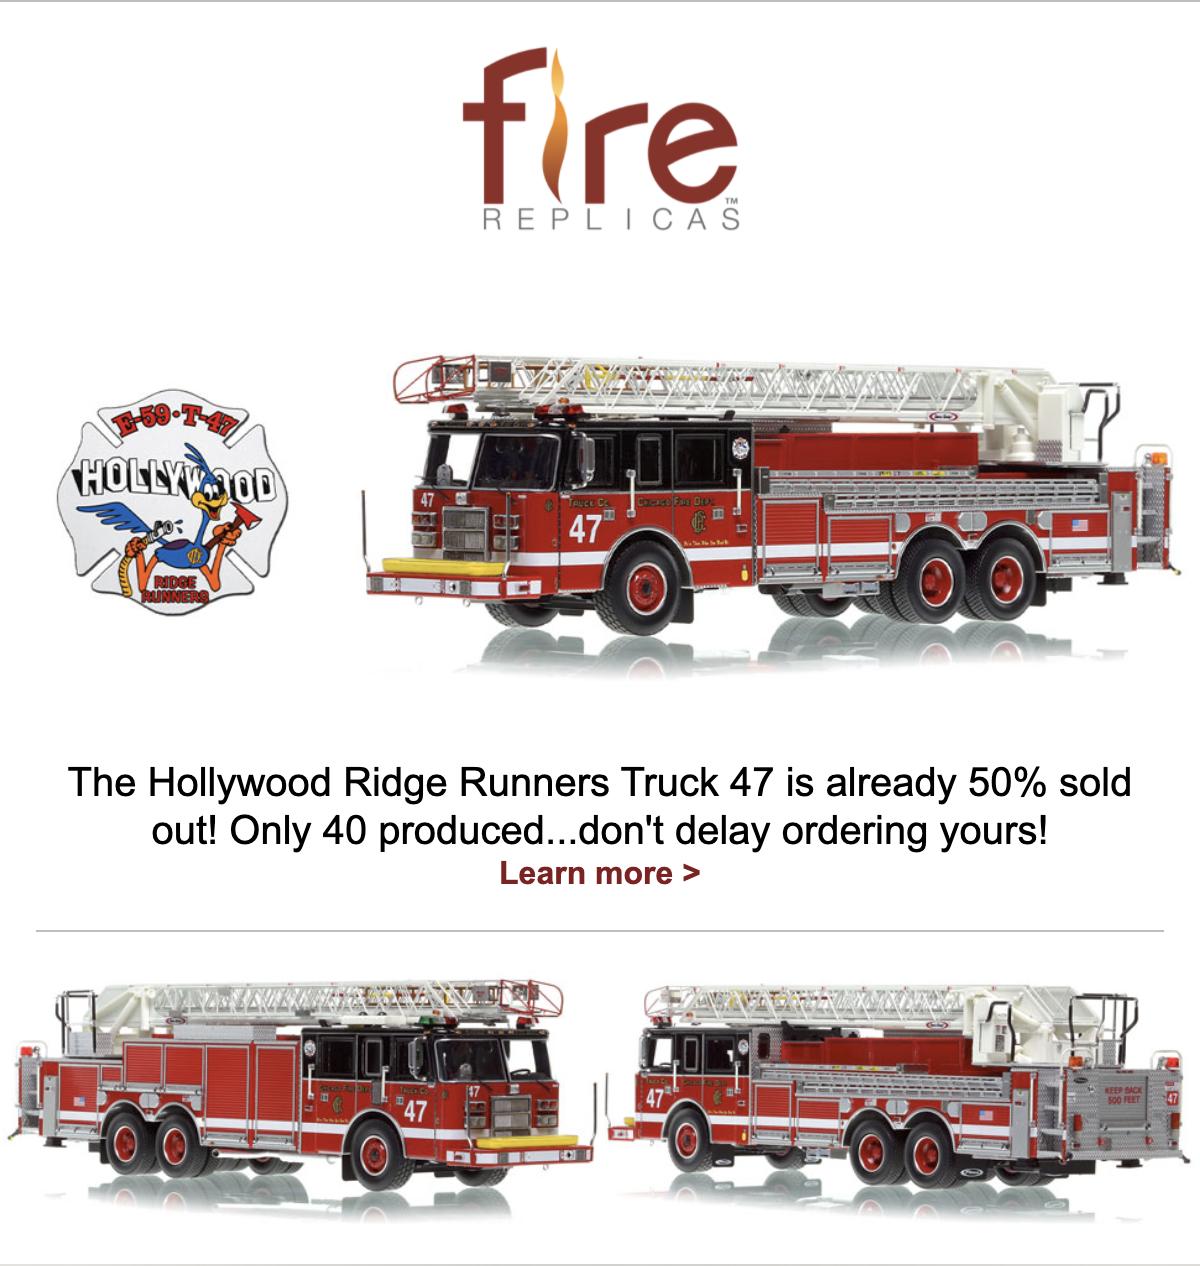 Fire Replicas model of Chicago FD Truck 47